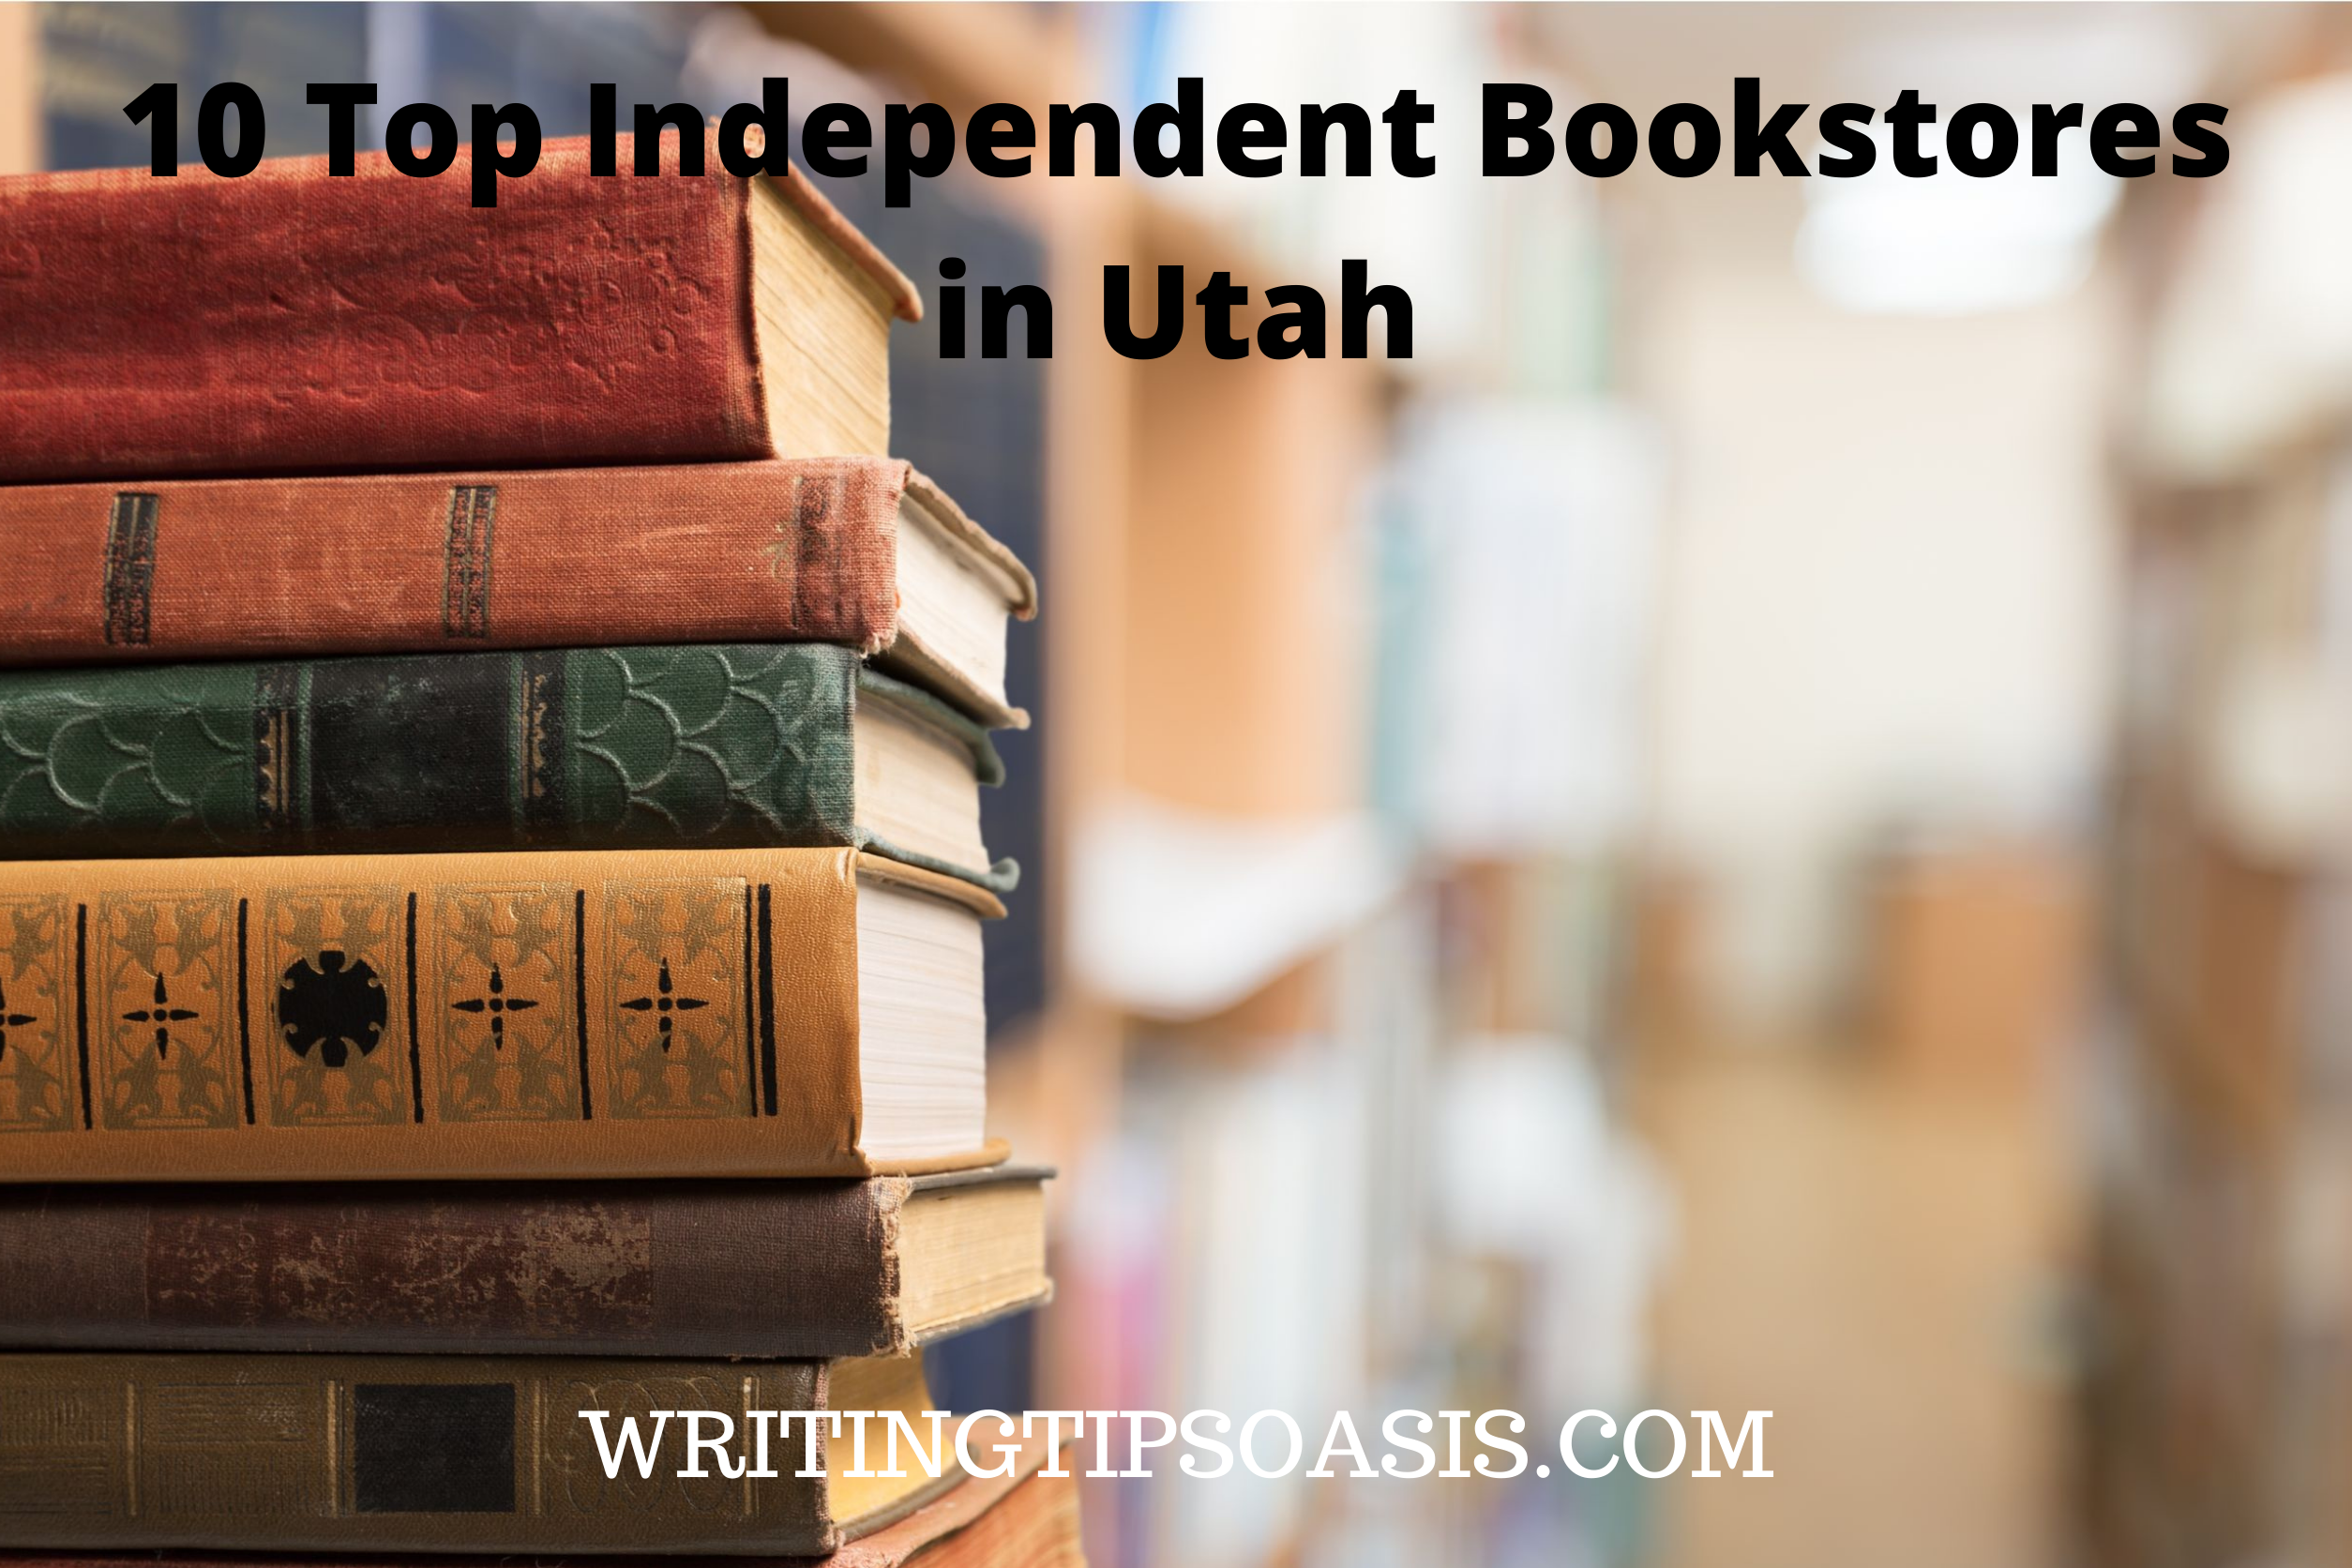 independent bookstores in Utah